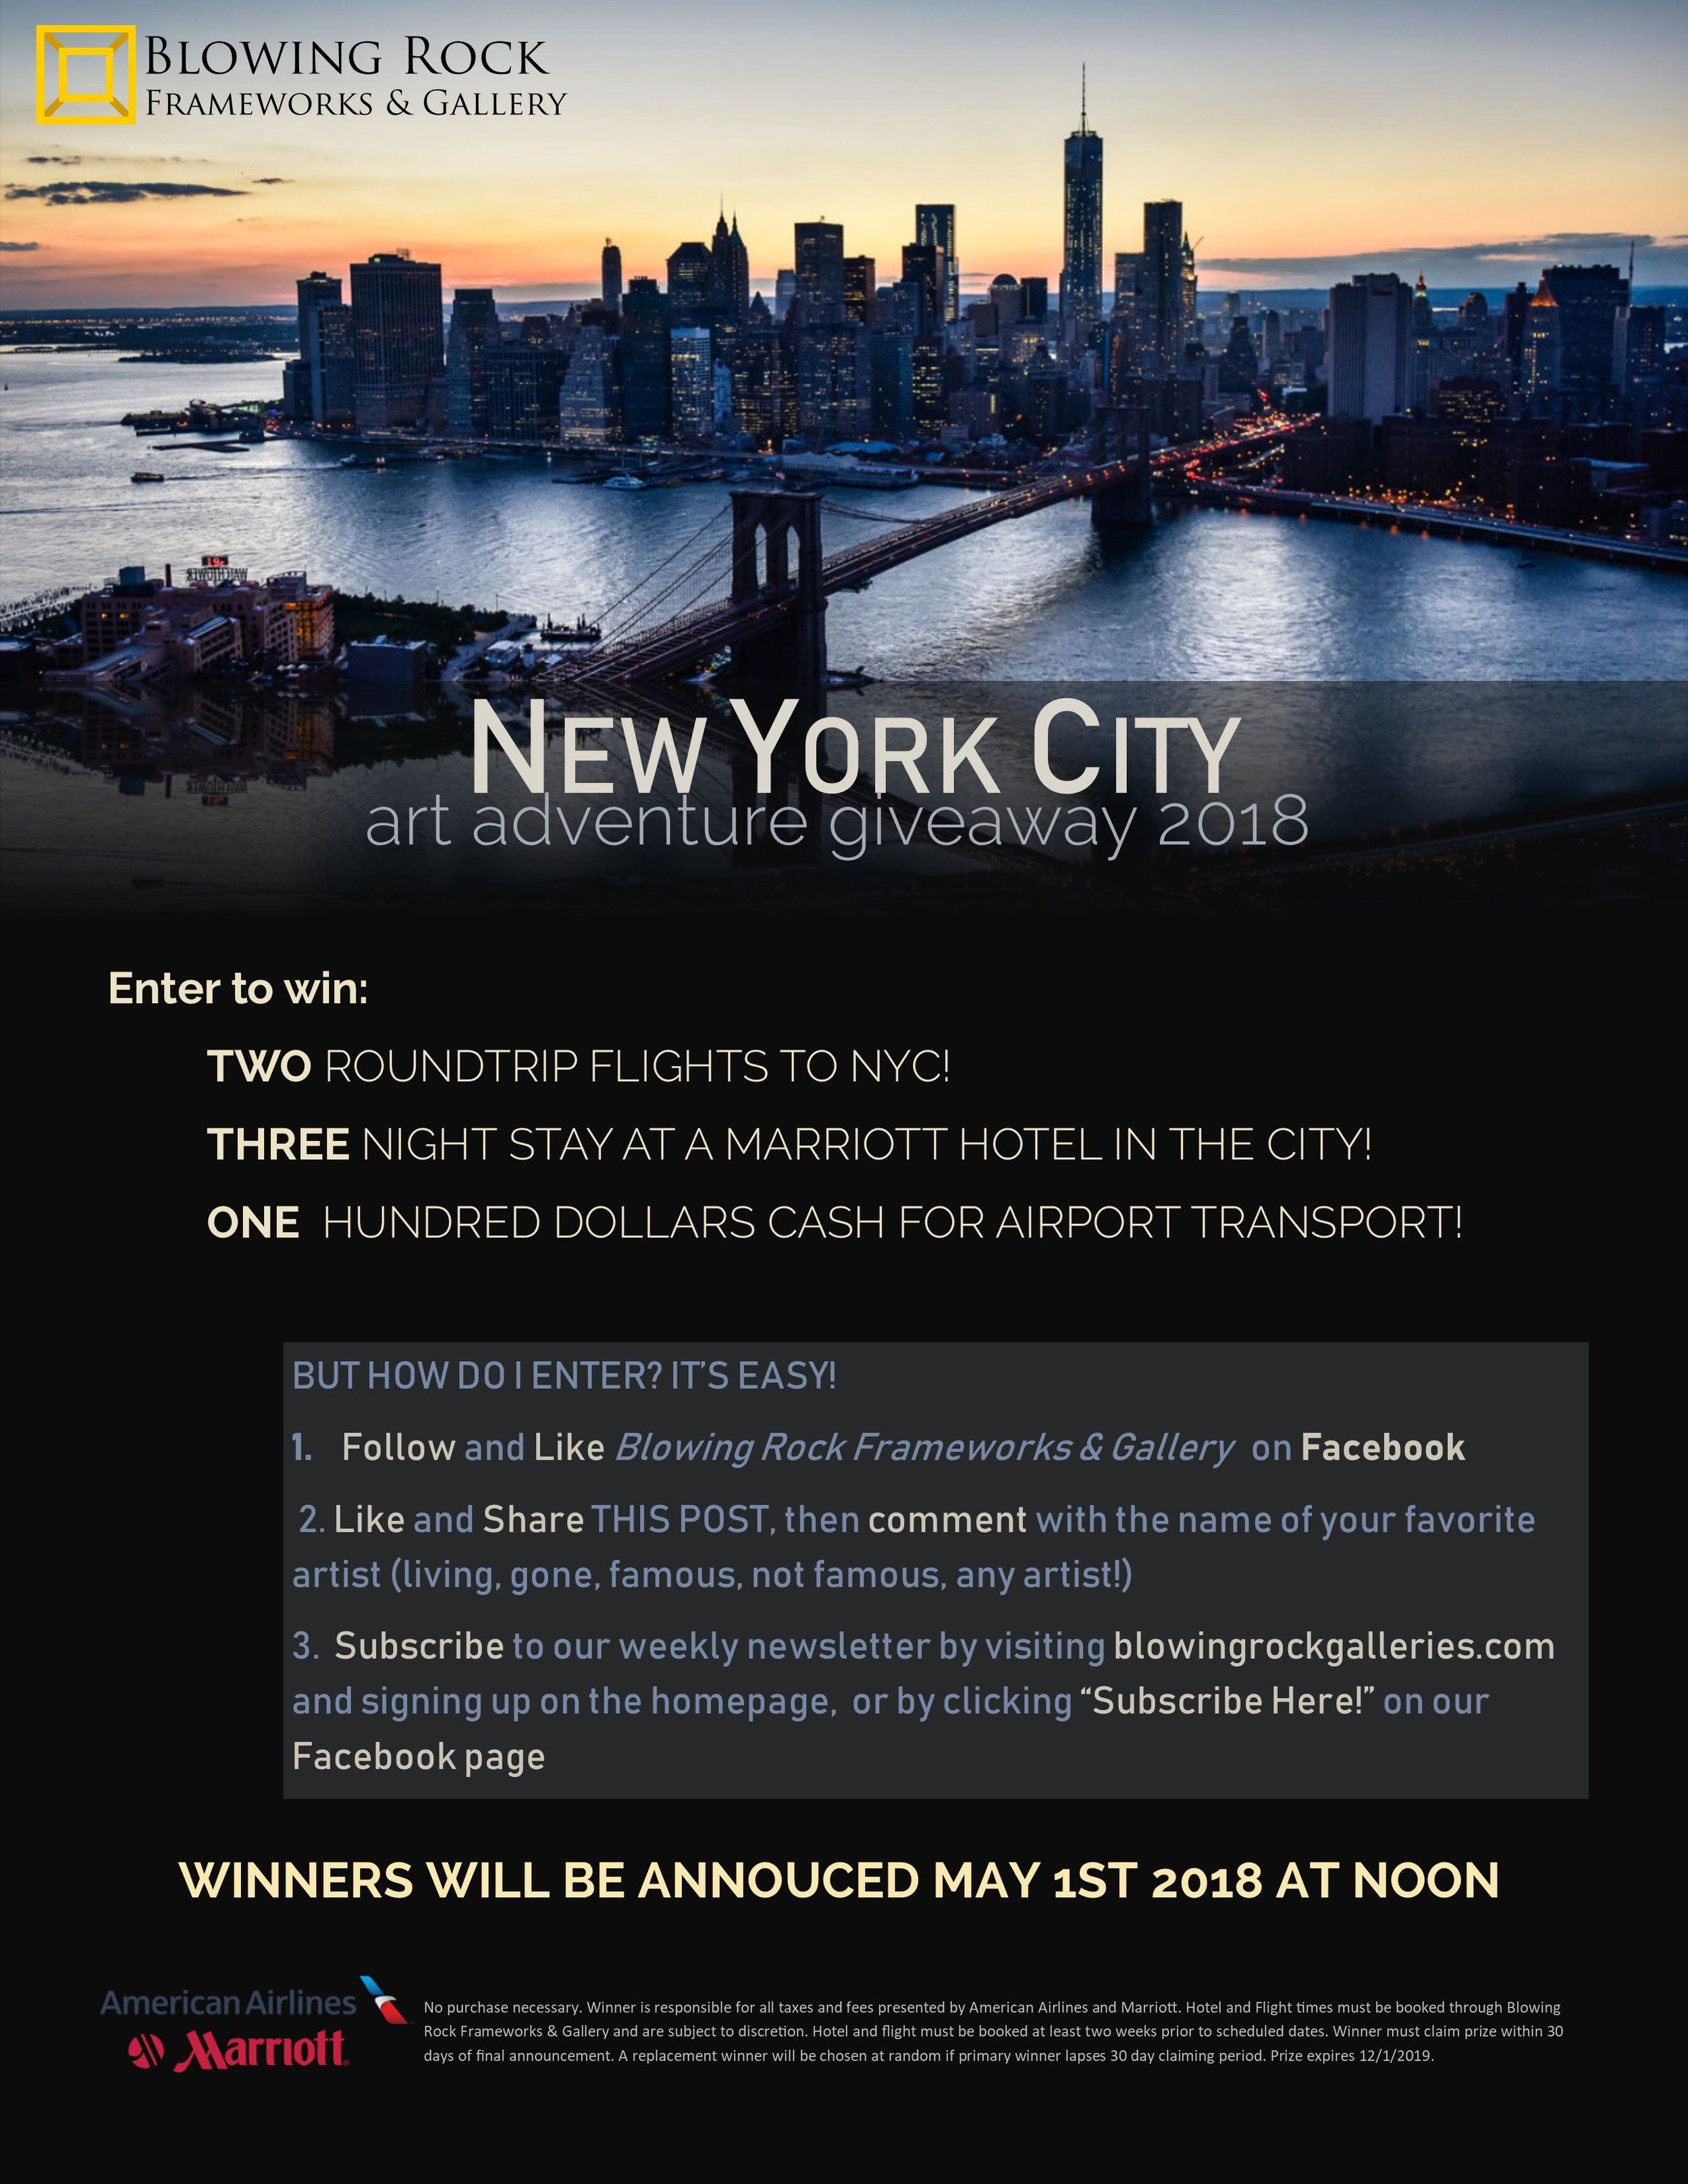 NYCGIVEAWAY2018.jpg